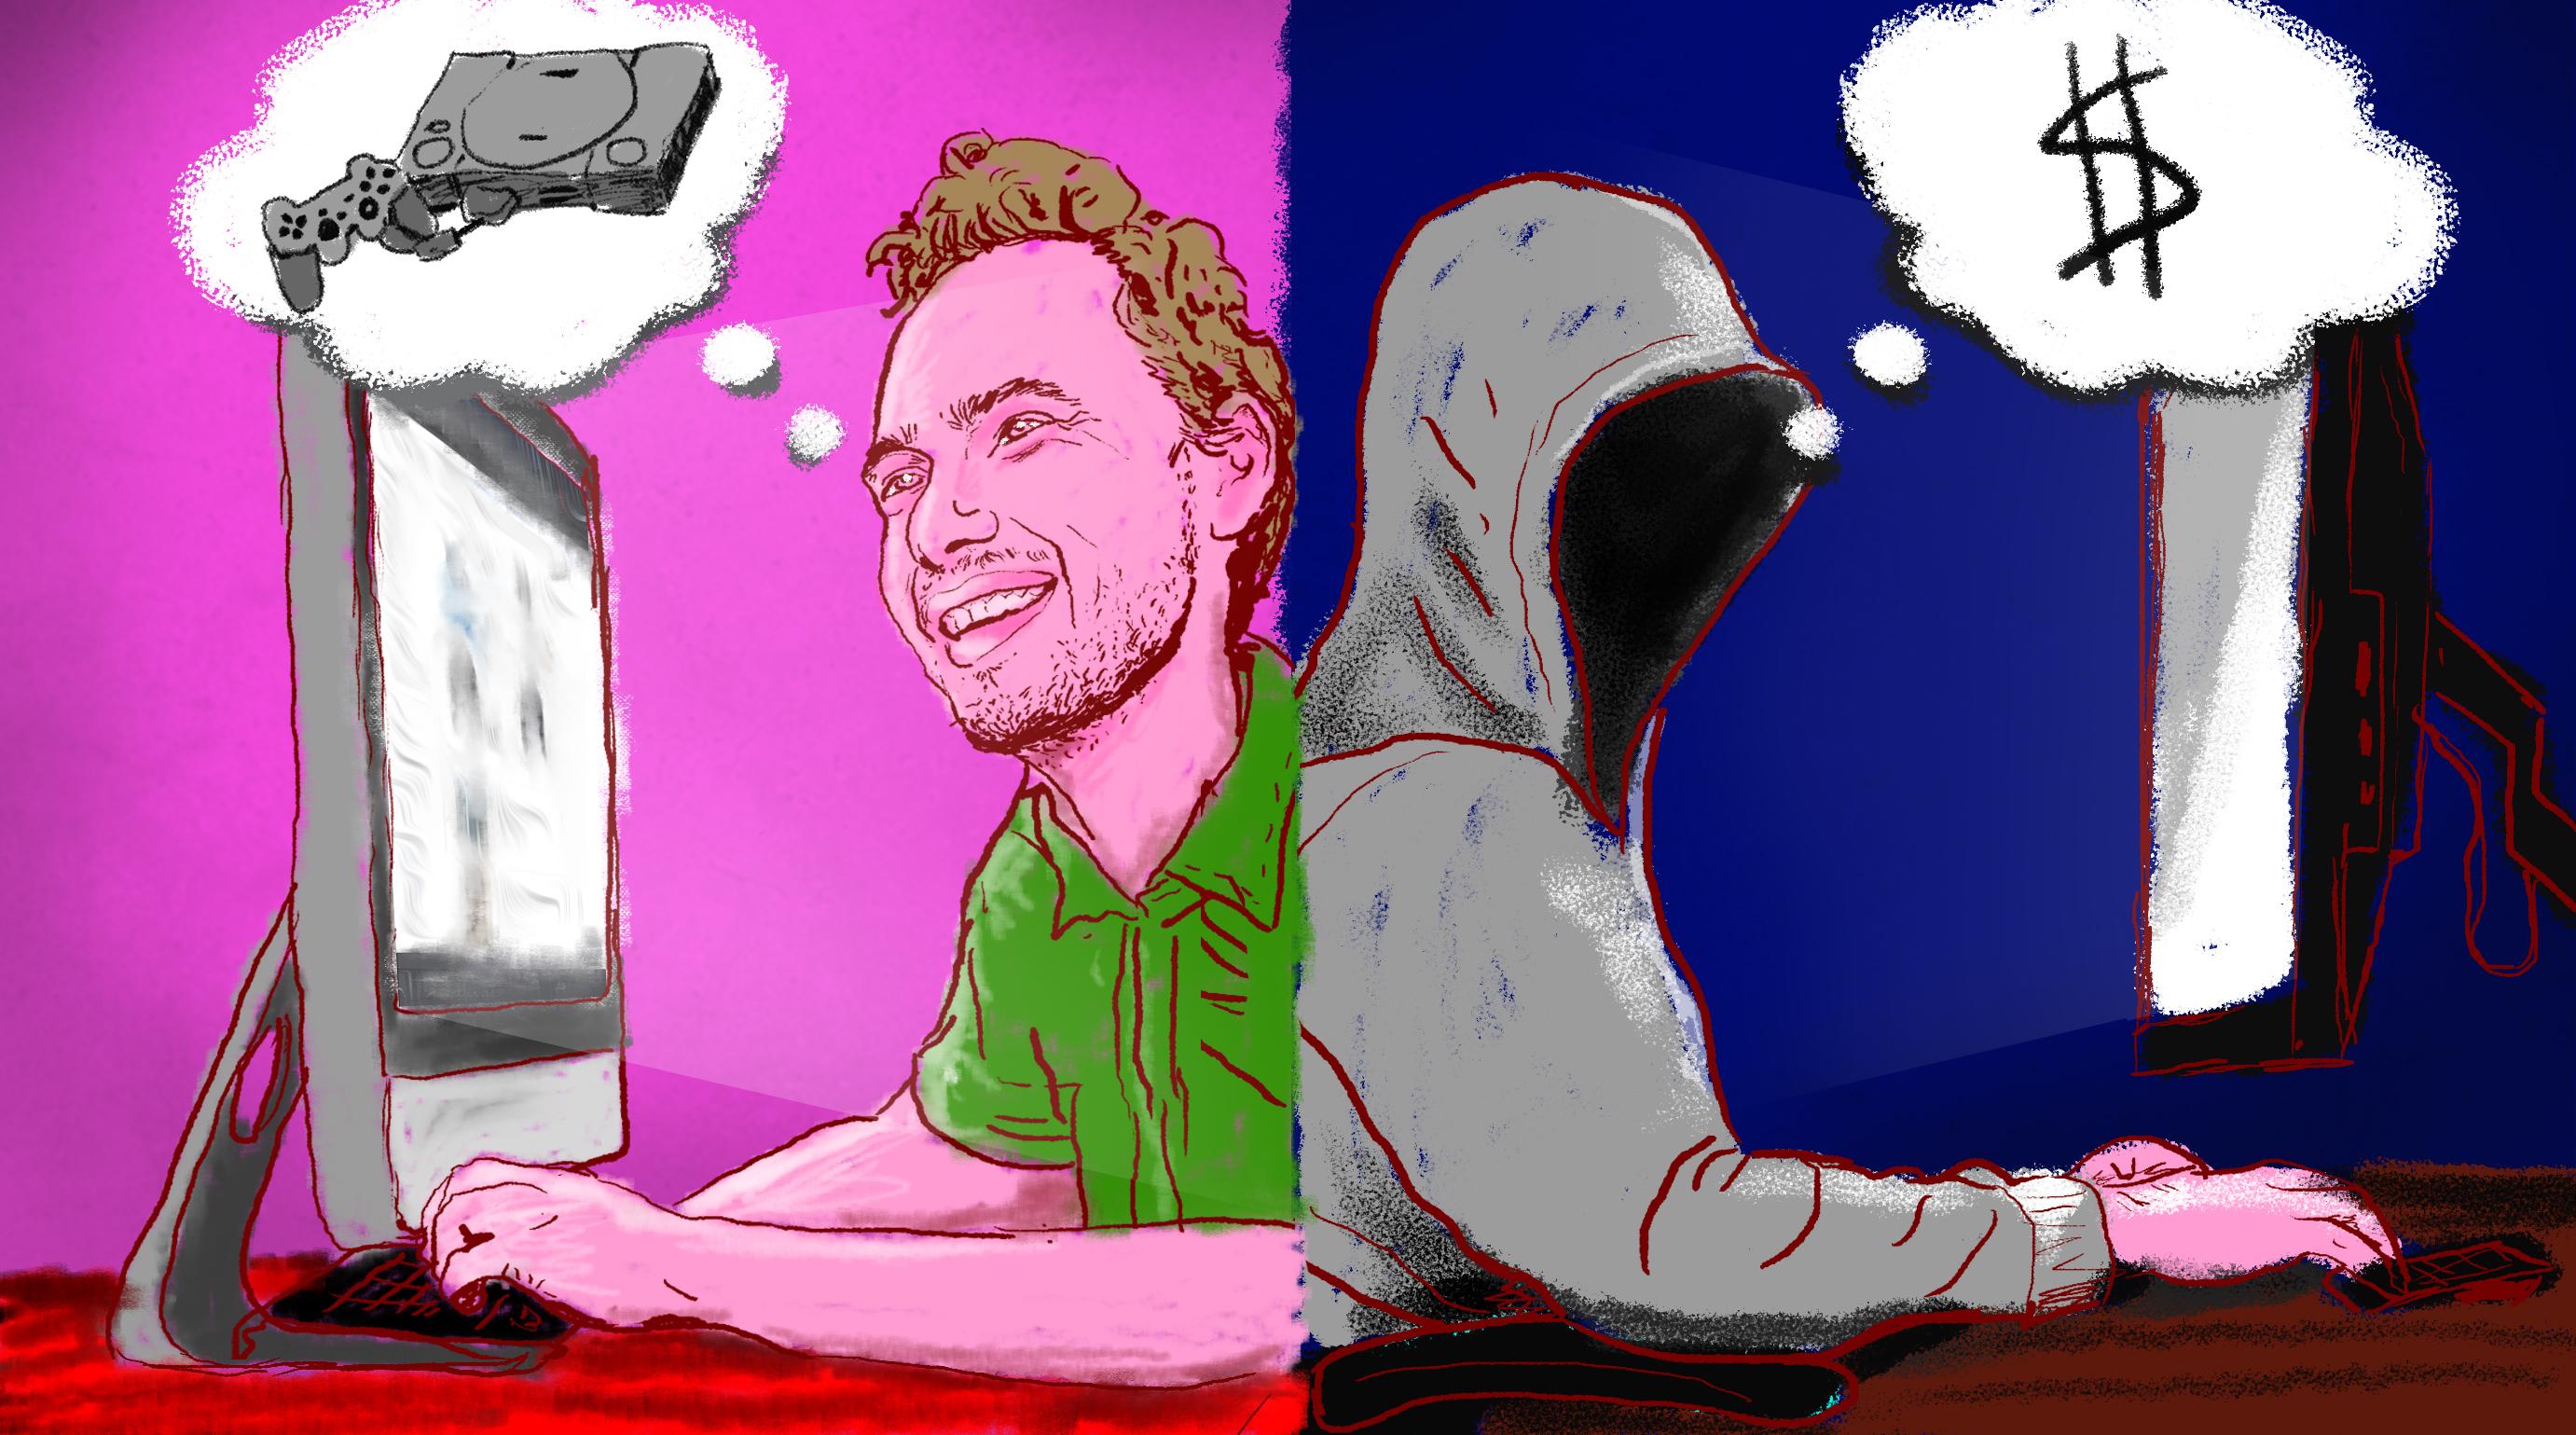 Internetsvindel